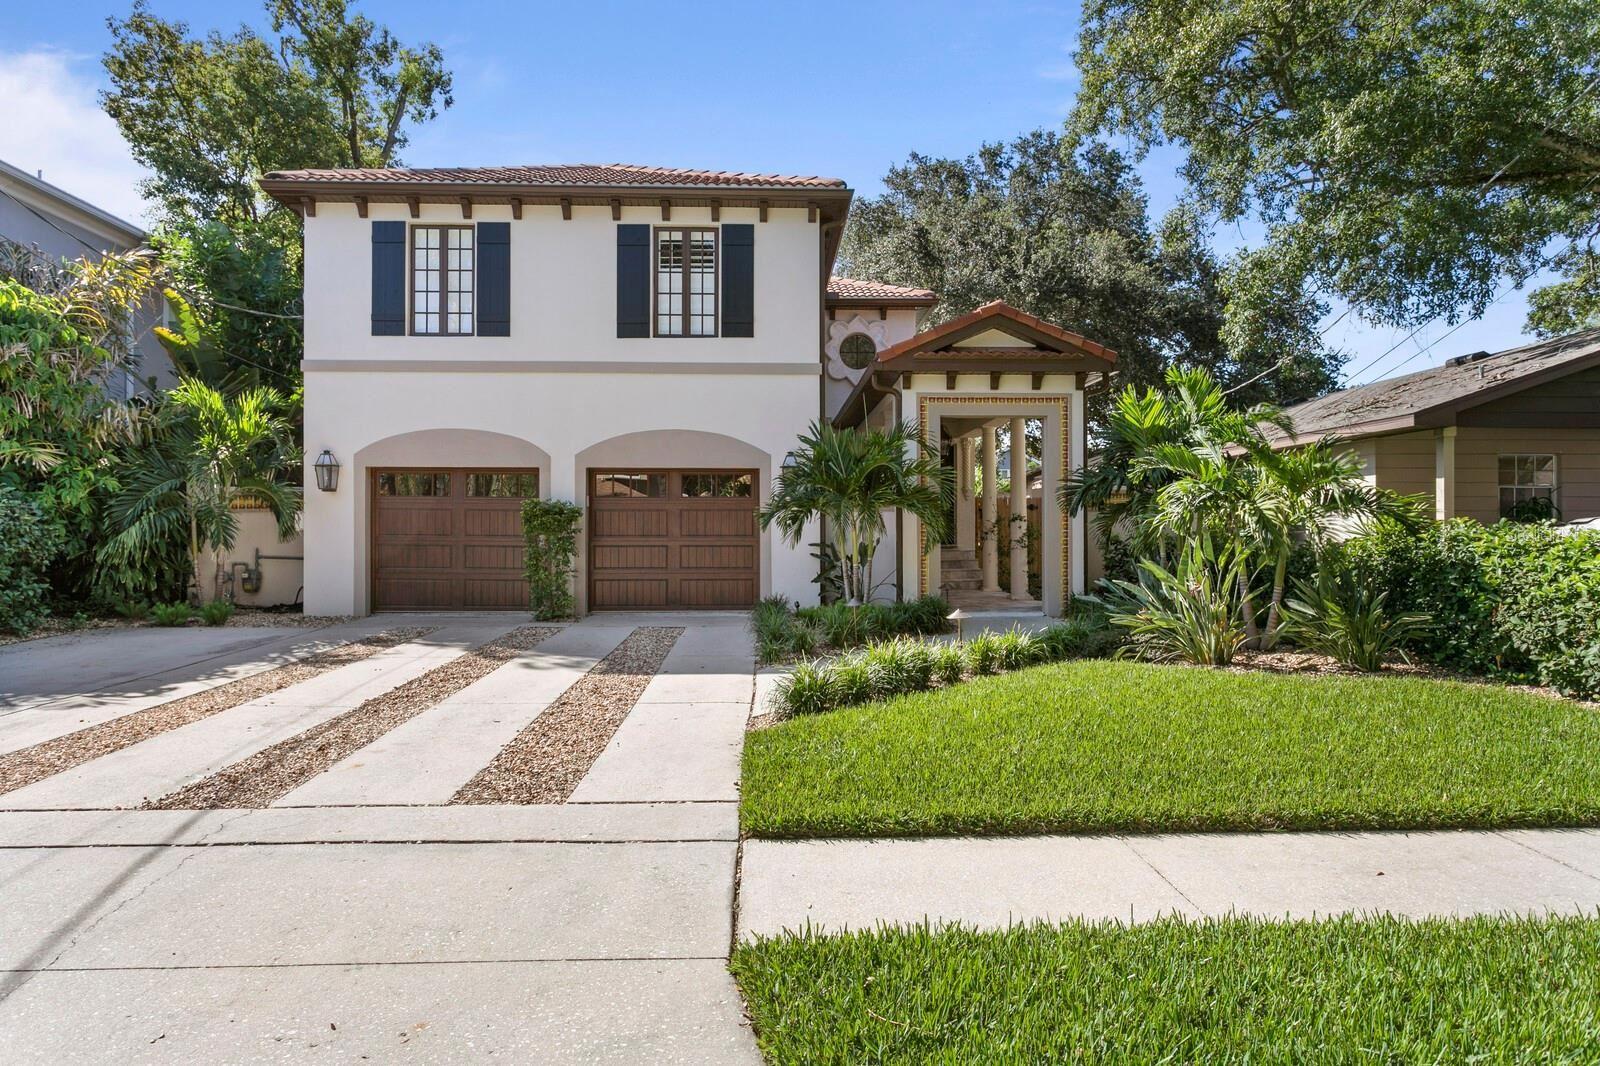 3308 W LAWN AVENUE, Tampa, FL 33611 - #: T3335241